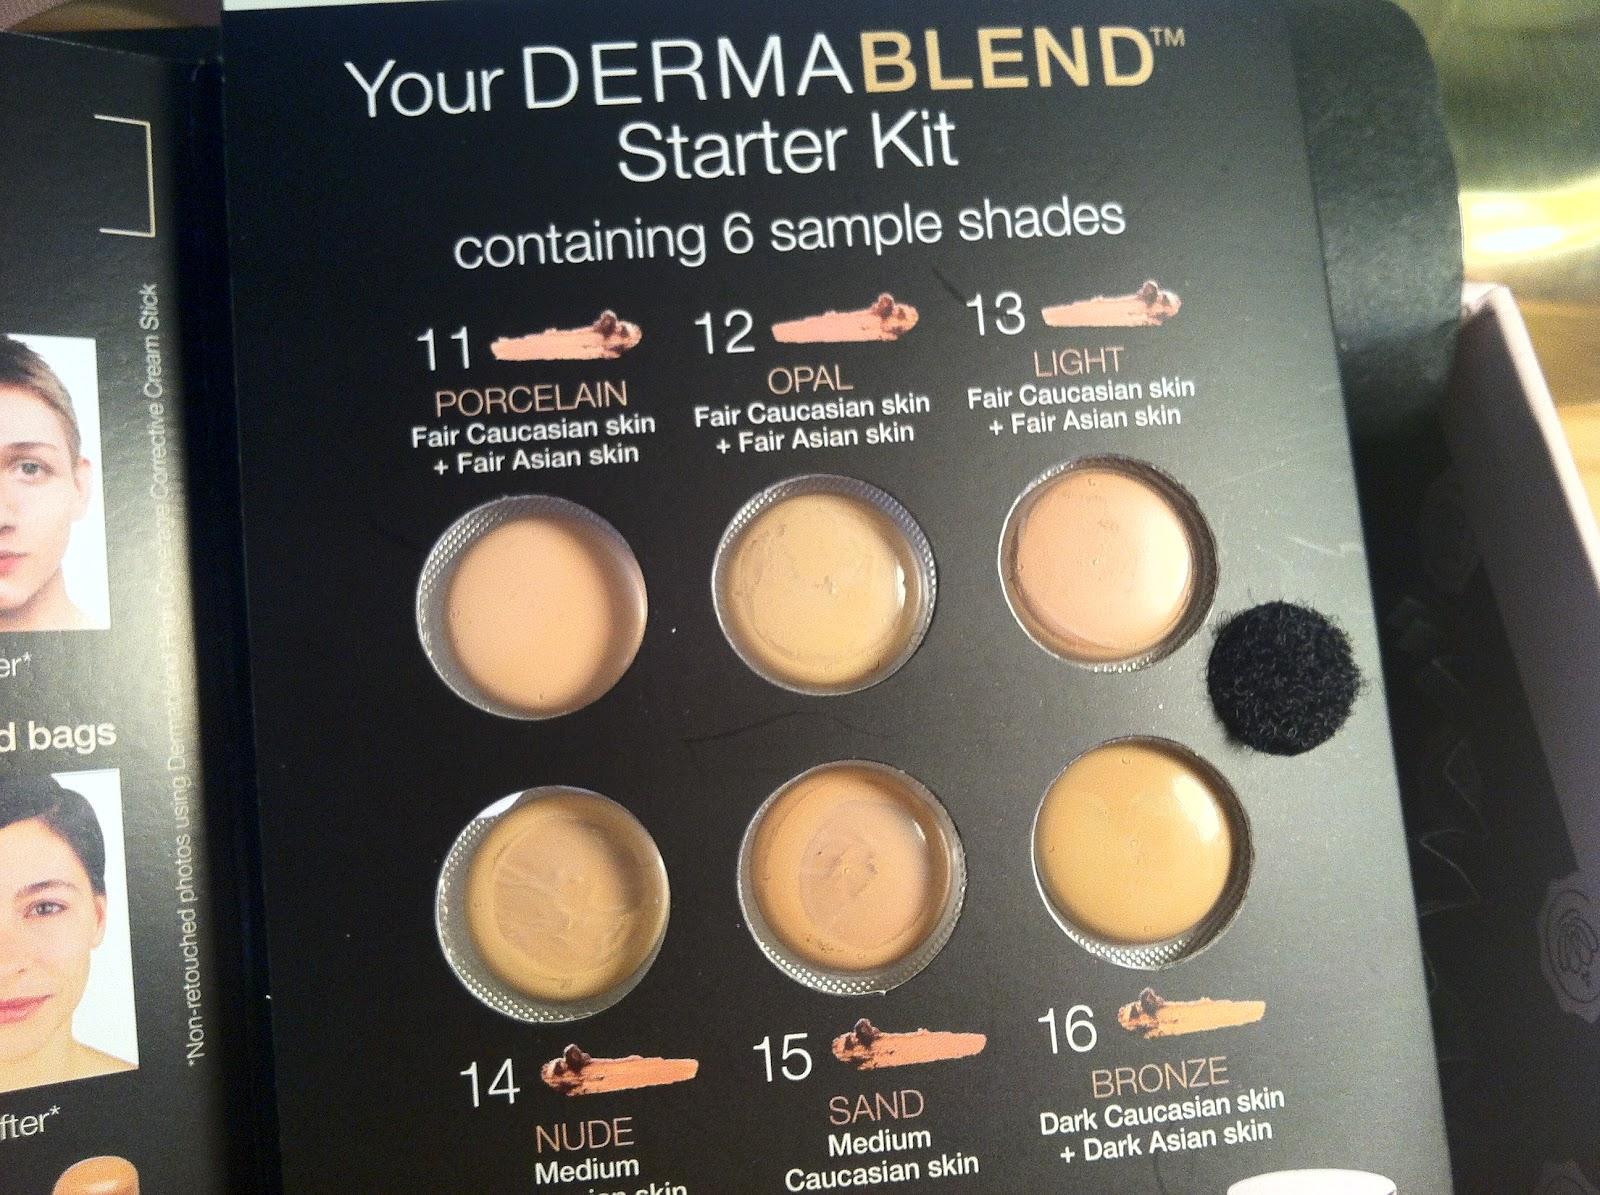 Pin Vichy Dermablend Cream Stick 11121314151617 On Pinterest